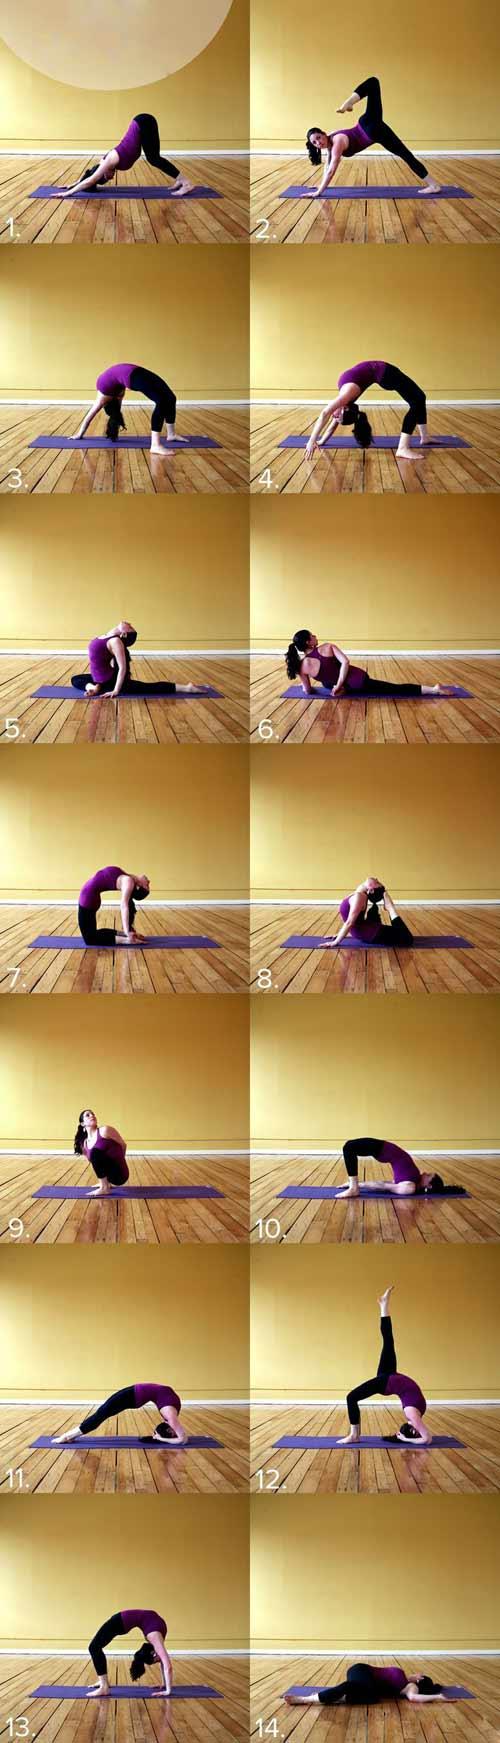 yoga-12-12-2